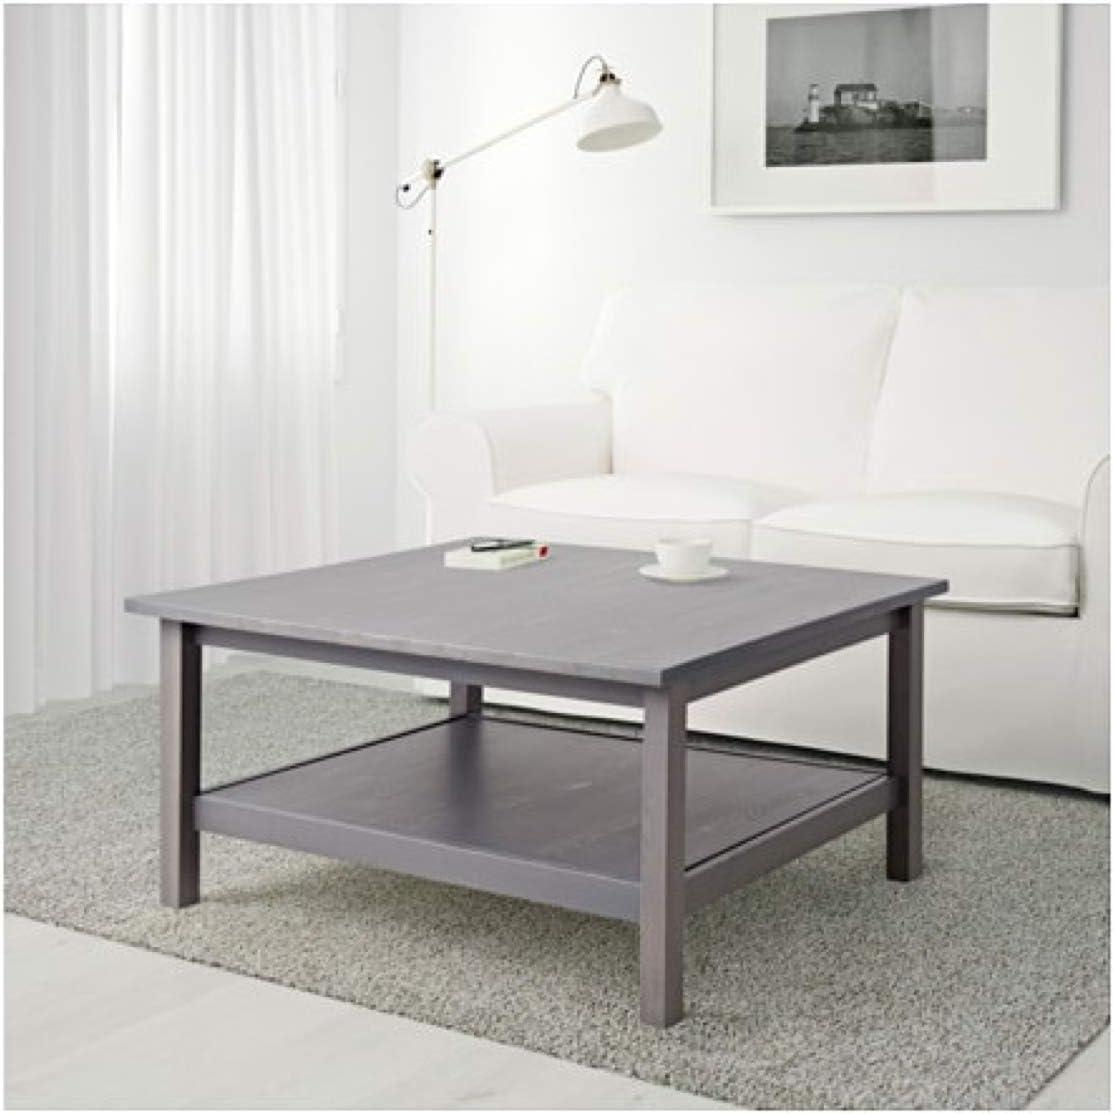 Amazon Com Ikea Hennes Coffee Table Dark Gray Gray Stained